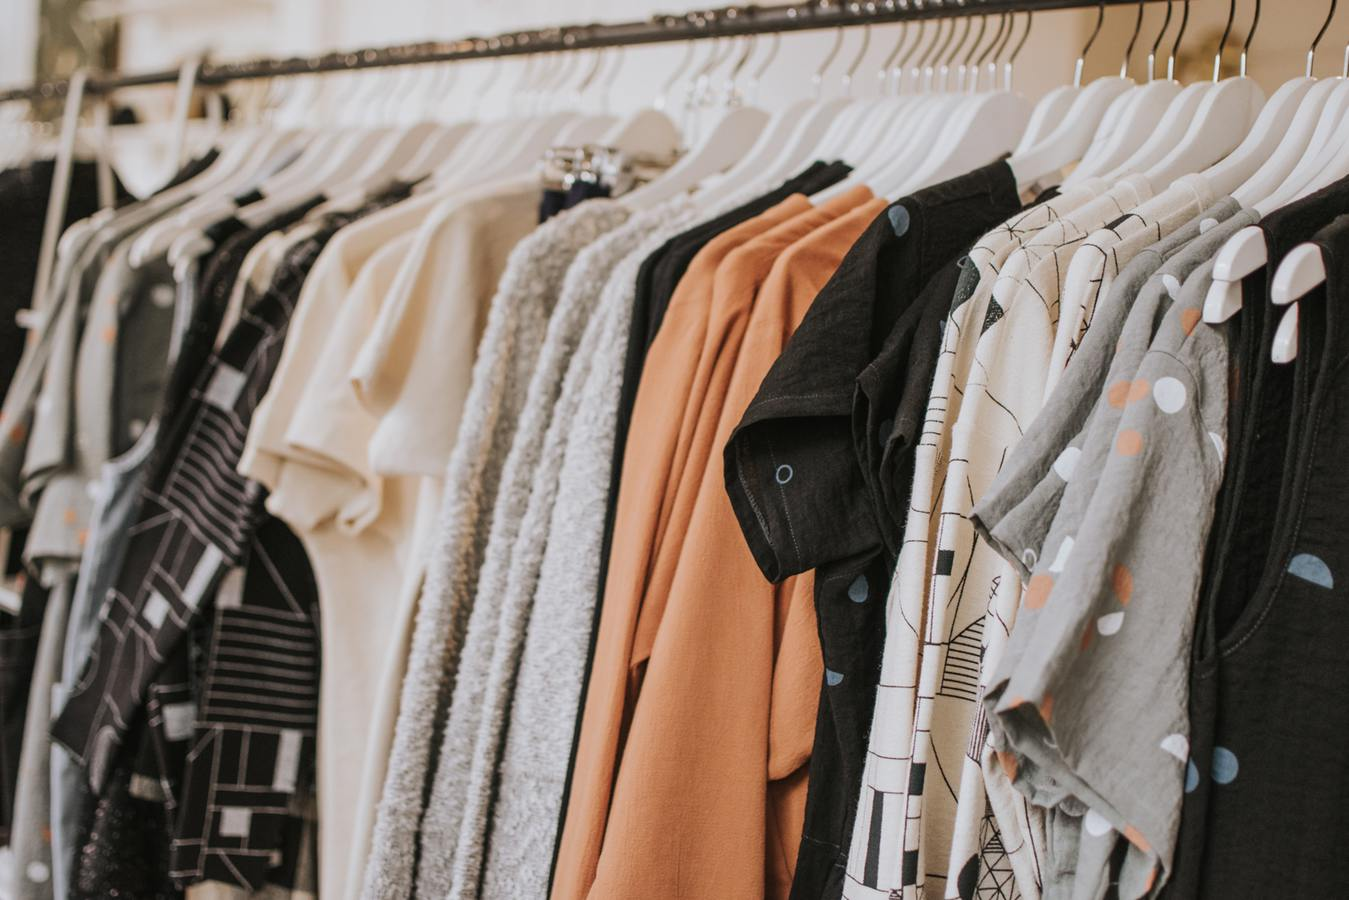 Reling z ubraniami